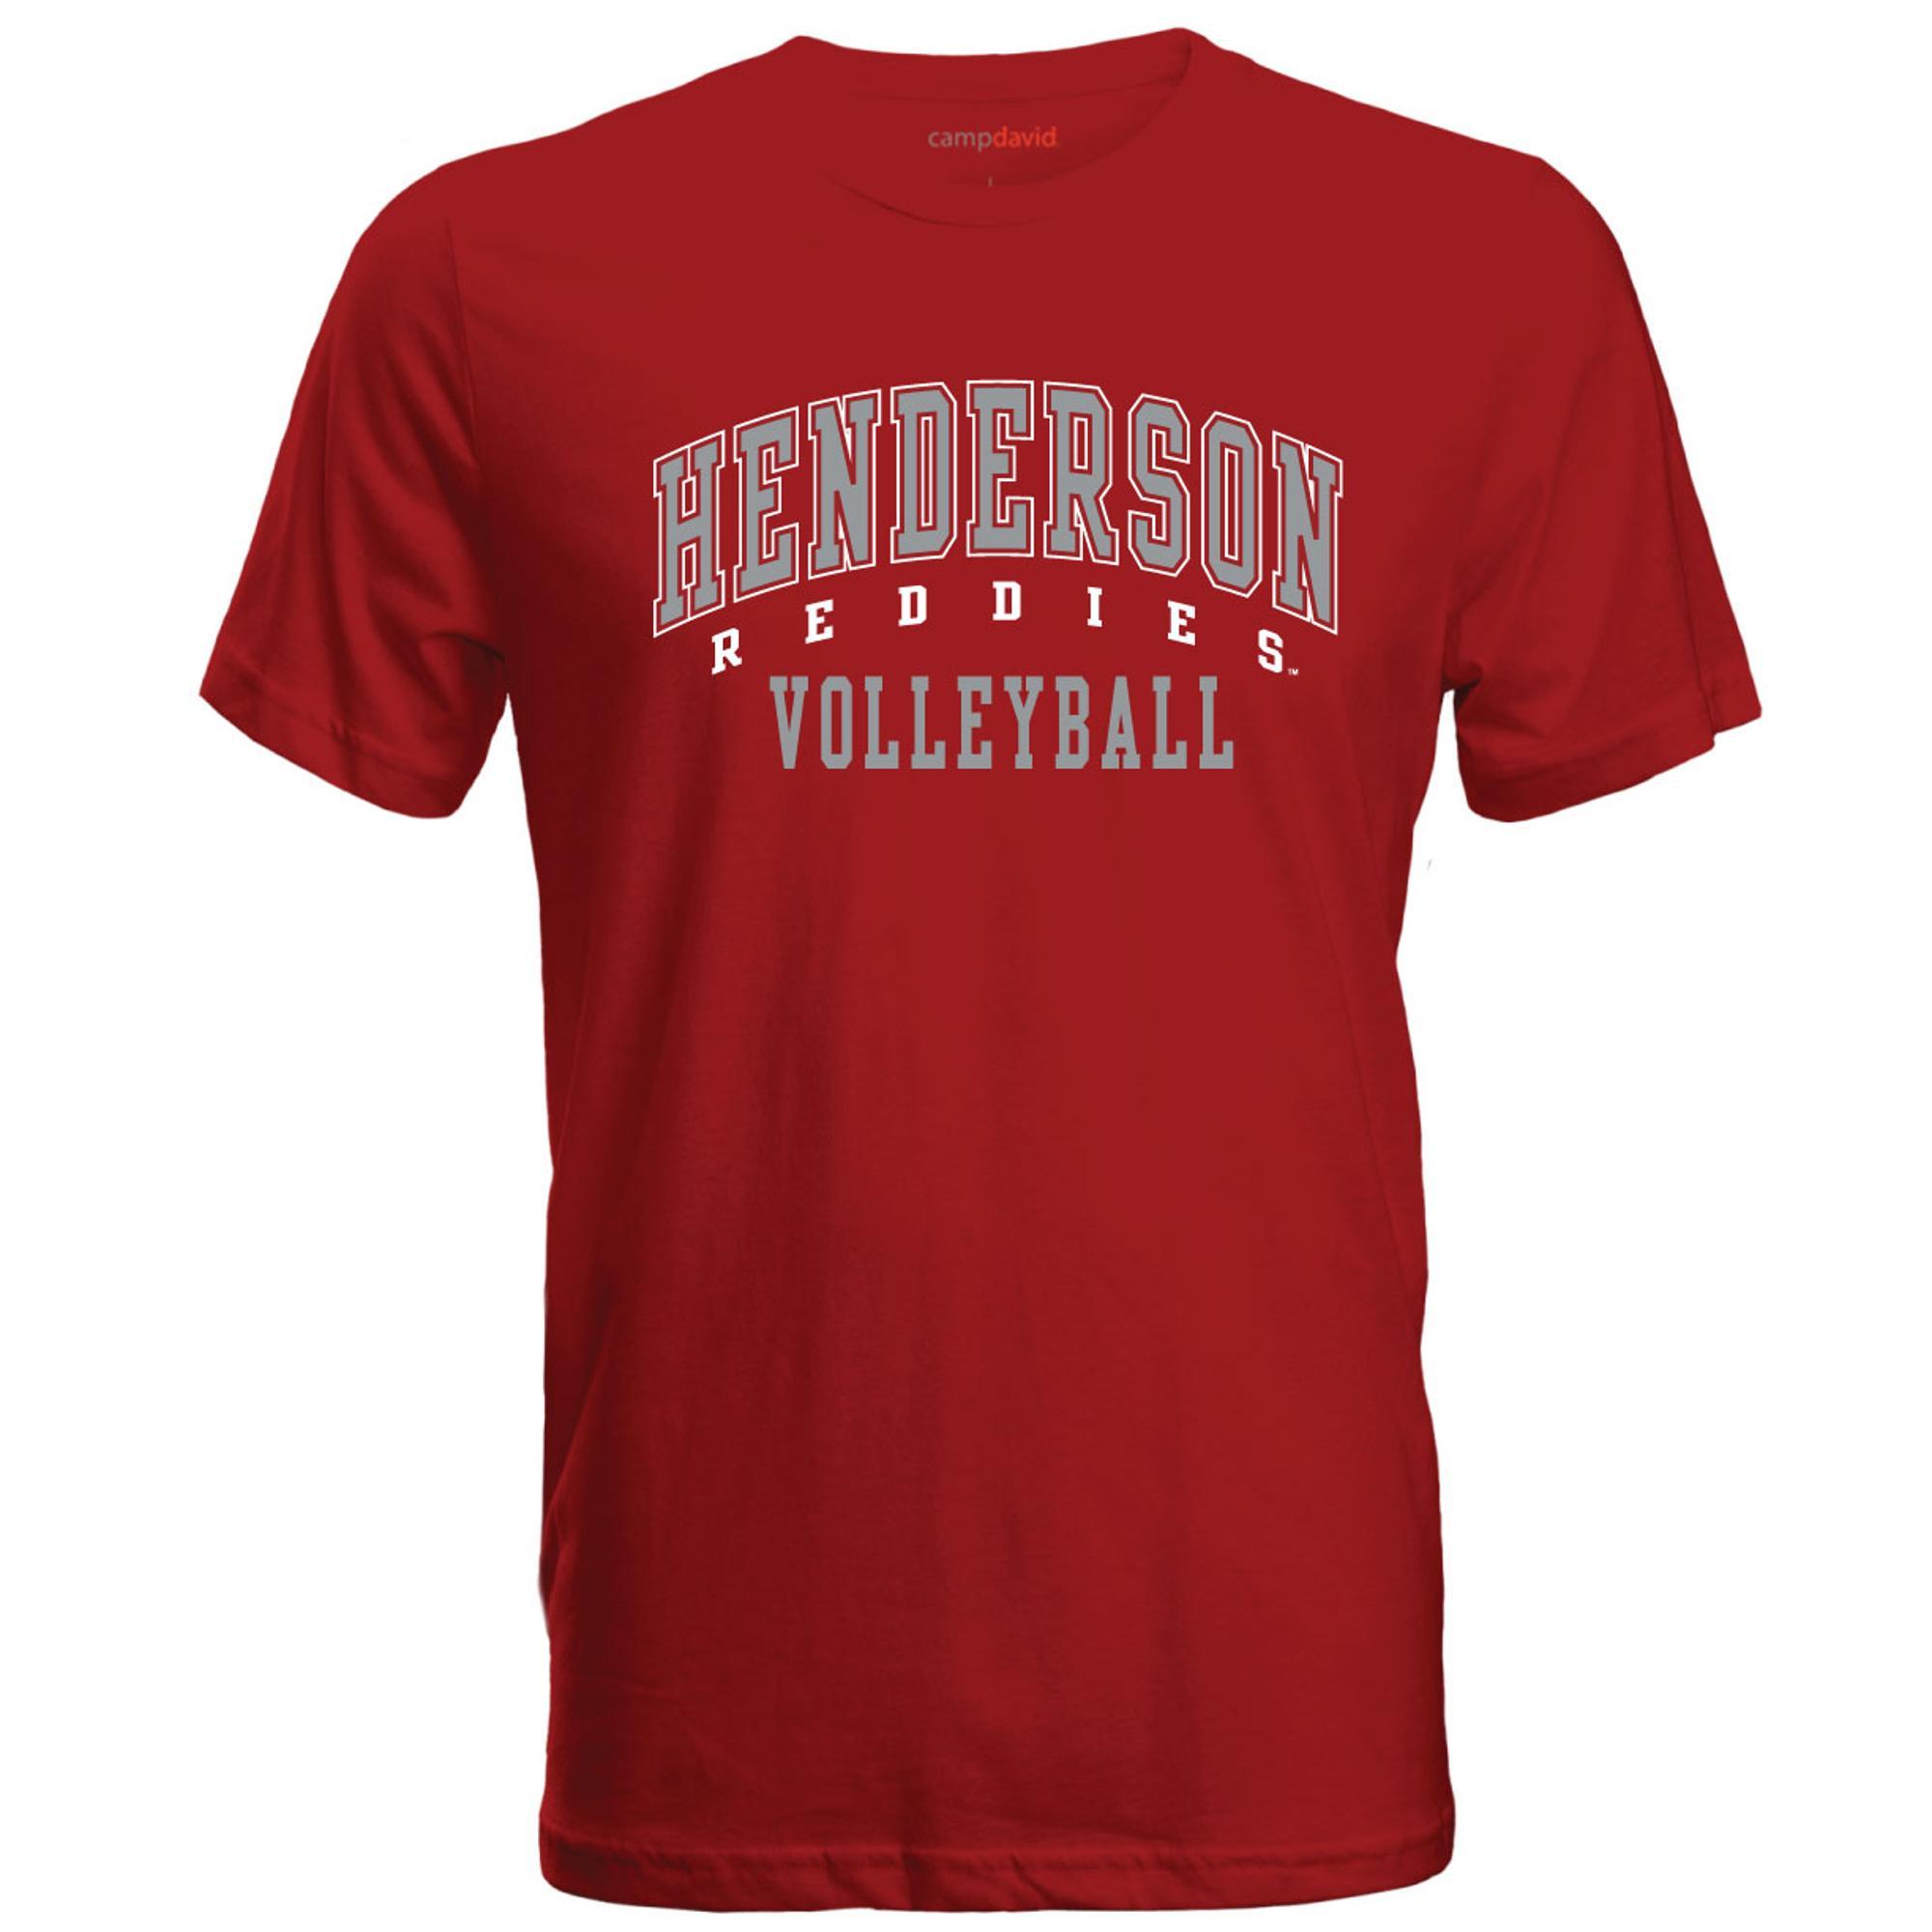 image of: Henderson Reddies Volleyball Cruiser Tee